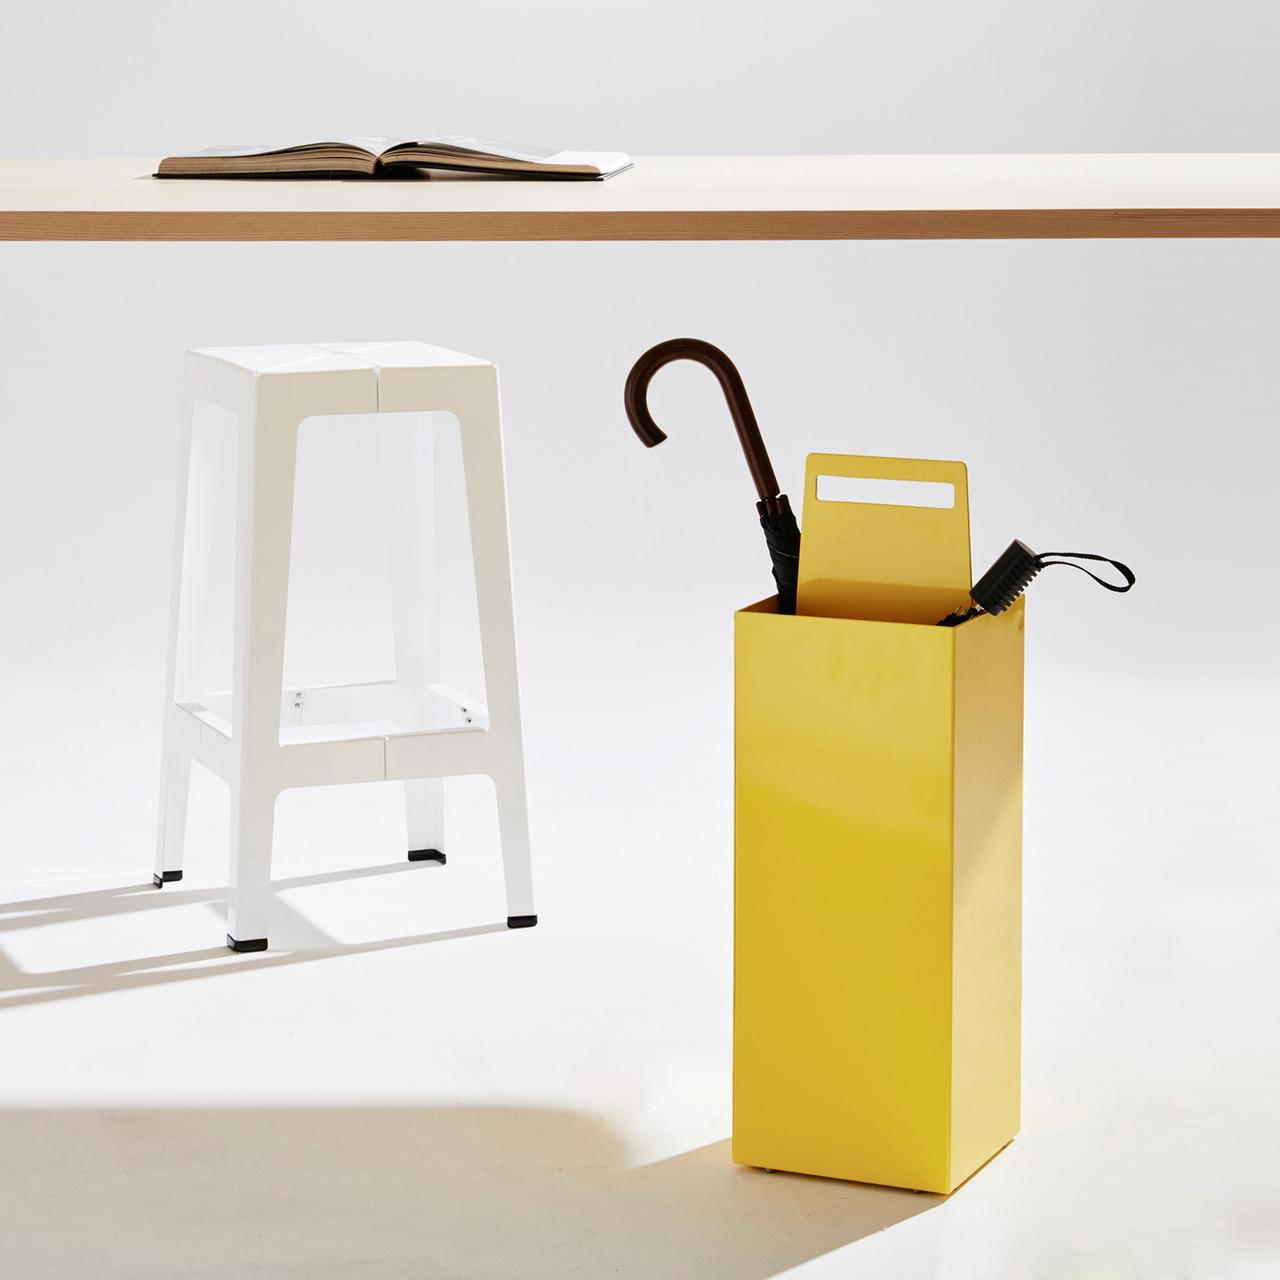 A Modern Umbrella Stand For Designbythem